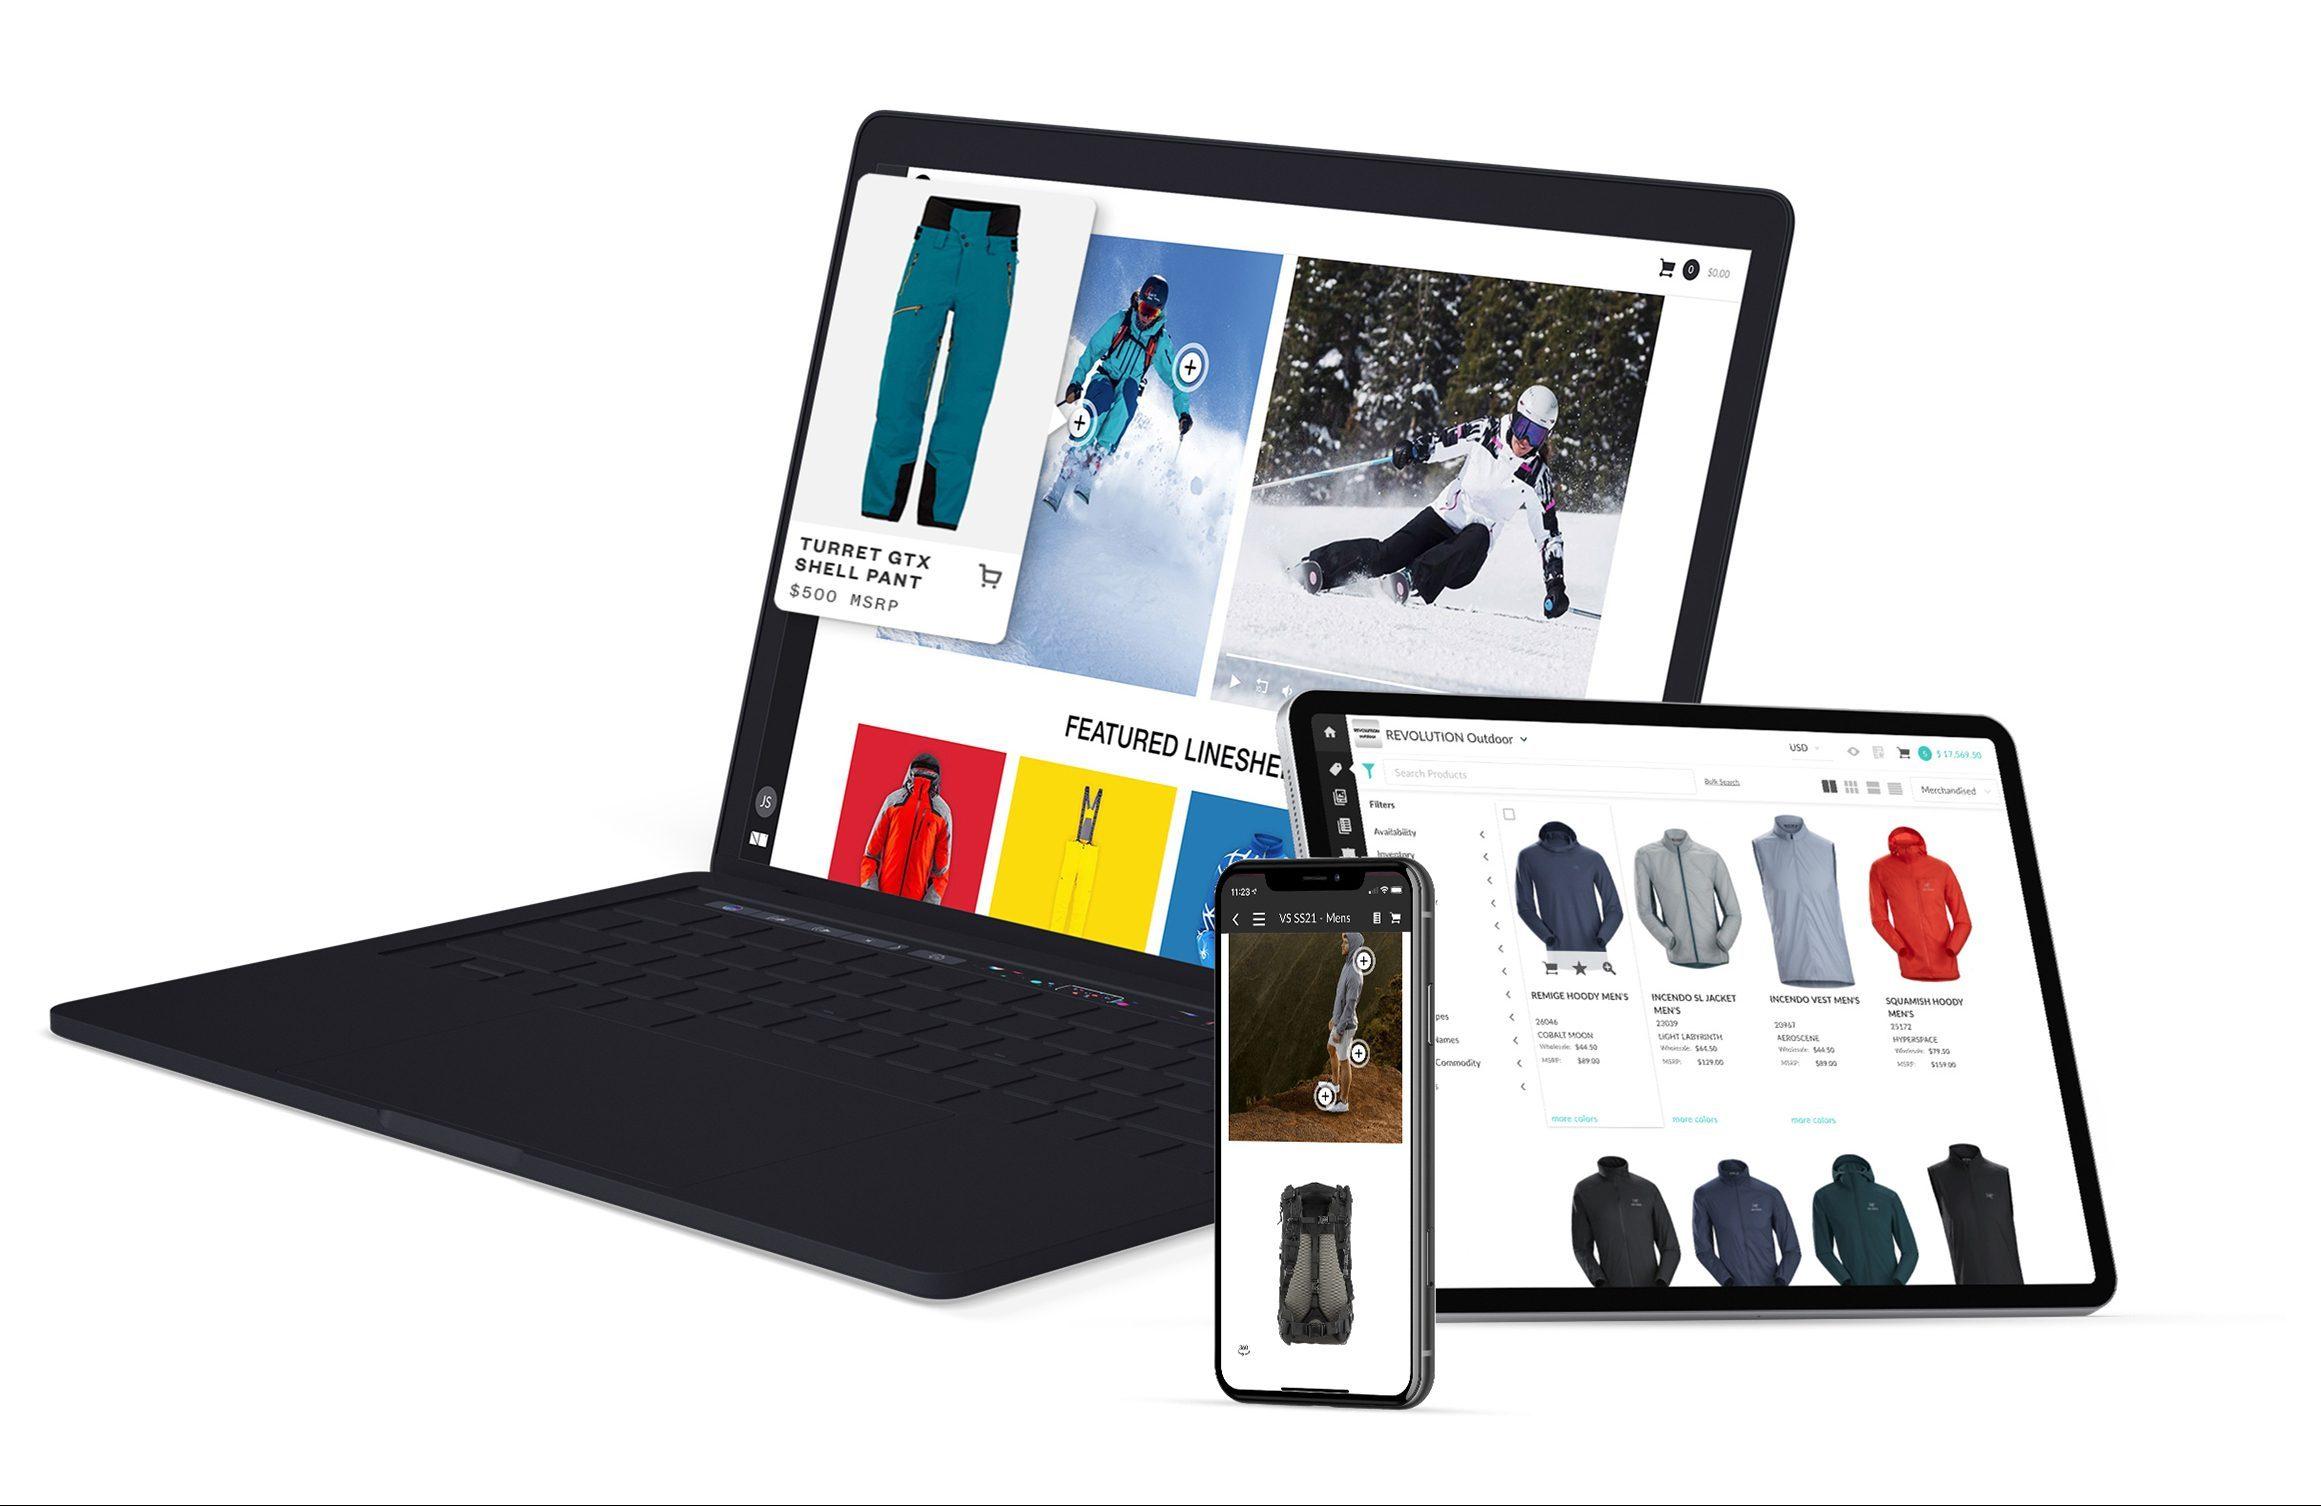 Desktop tablet and smartphone screen of NuOrder platform for outdoor market